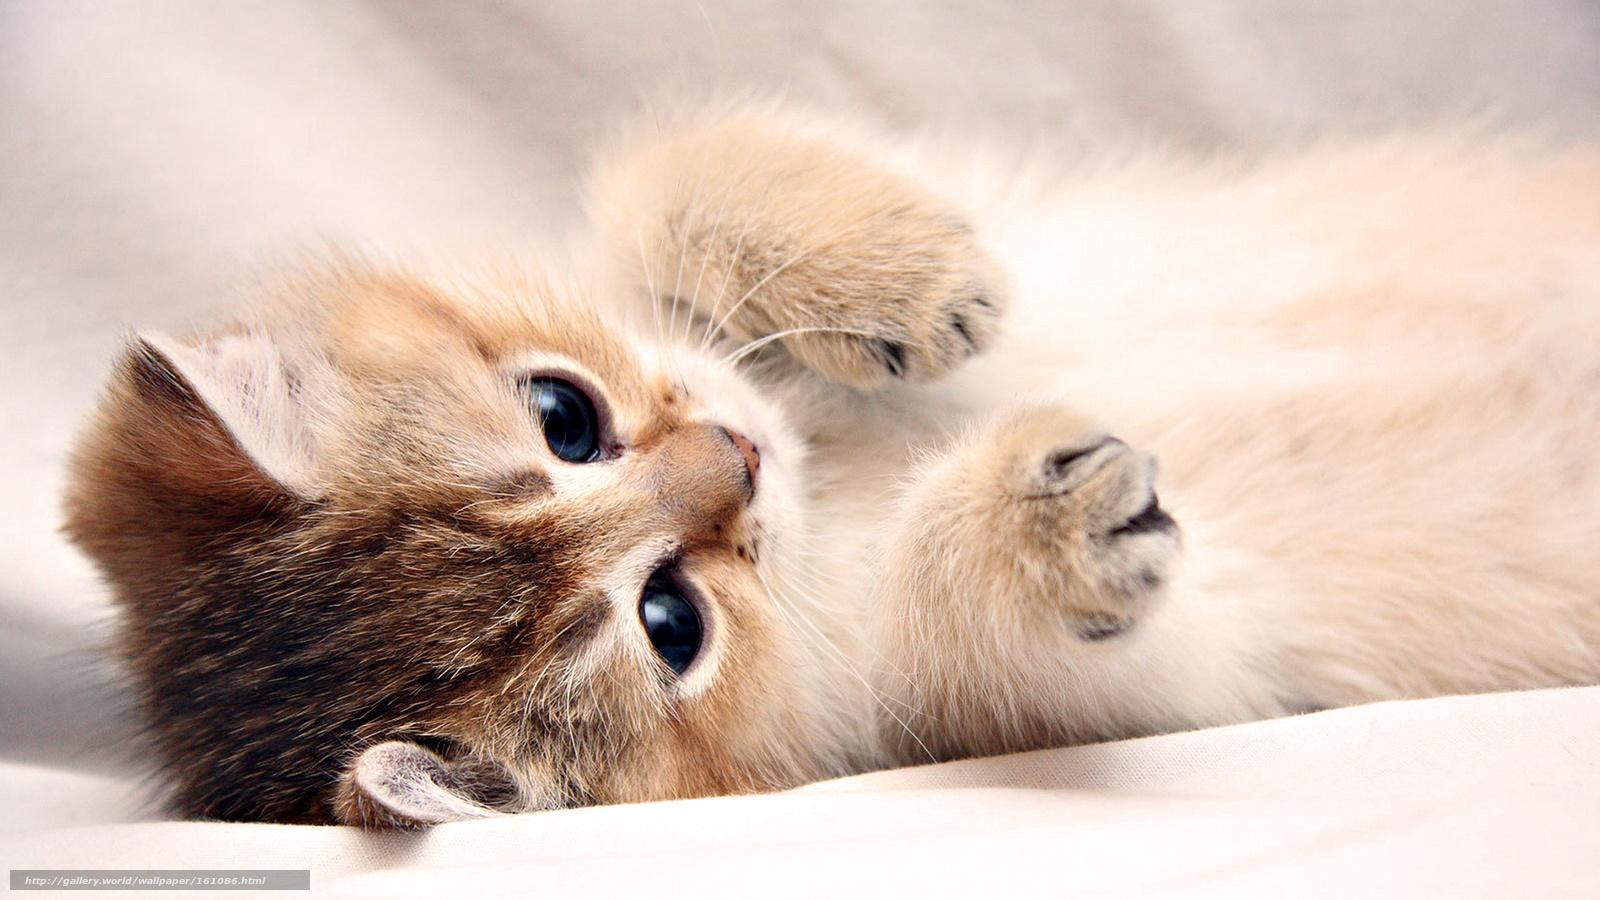 Tlcharger fond d 39 ecran chaton mignon fonds d 39 ecran for Fond ecran mignon